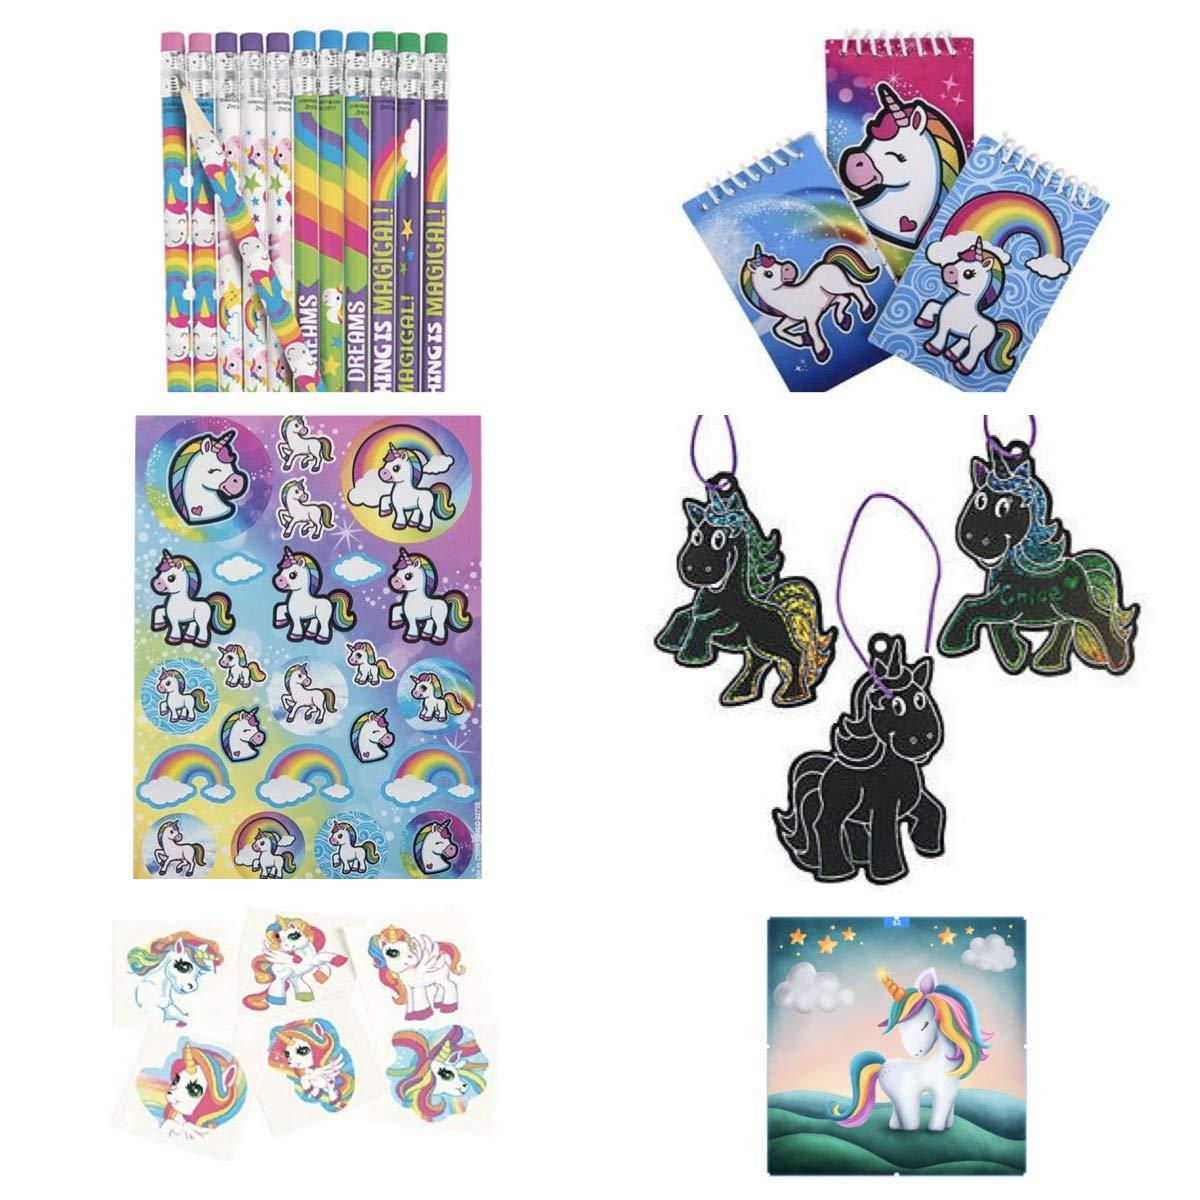 Mini Notebooks Tattoos Teacher Classroom School Supplies Rewards Incentive Motivation mixed 264 Pretty Rainbow Unicorn Party Favors Stickers Ornament Crafts Pencils